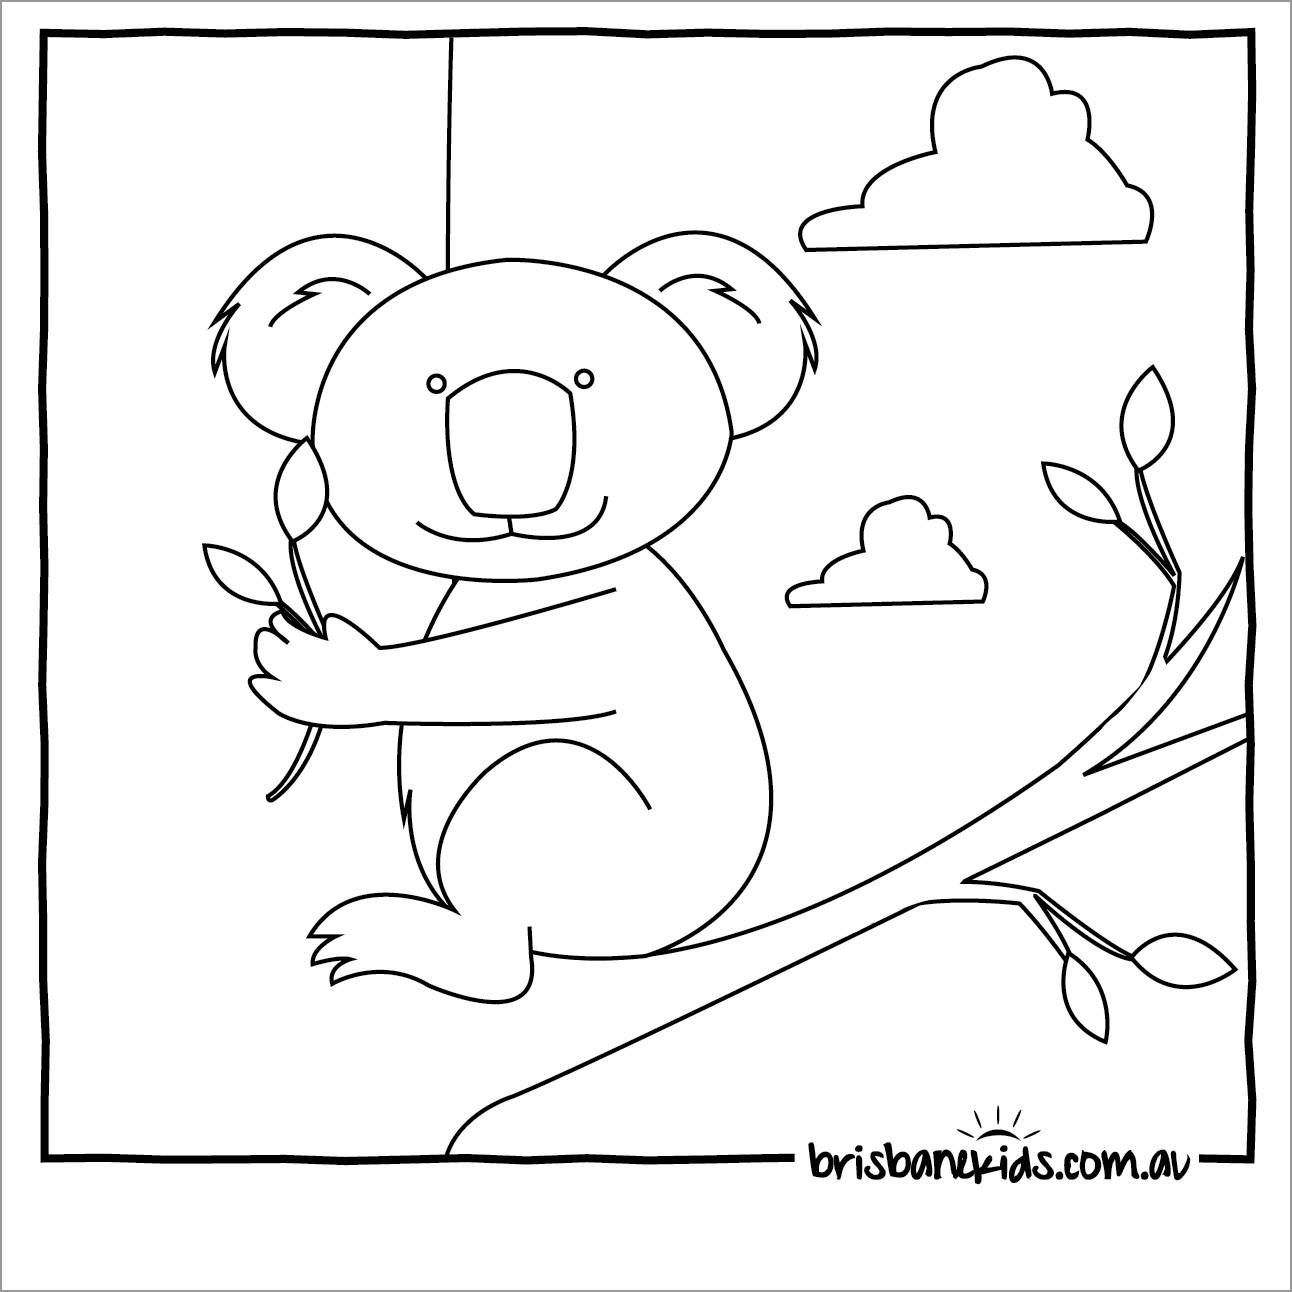 Coloring Page Of A Koala